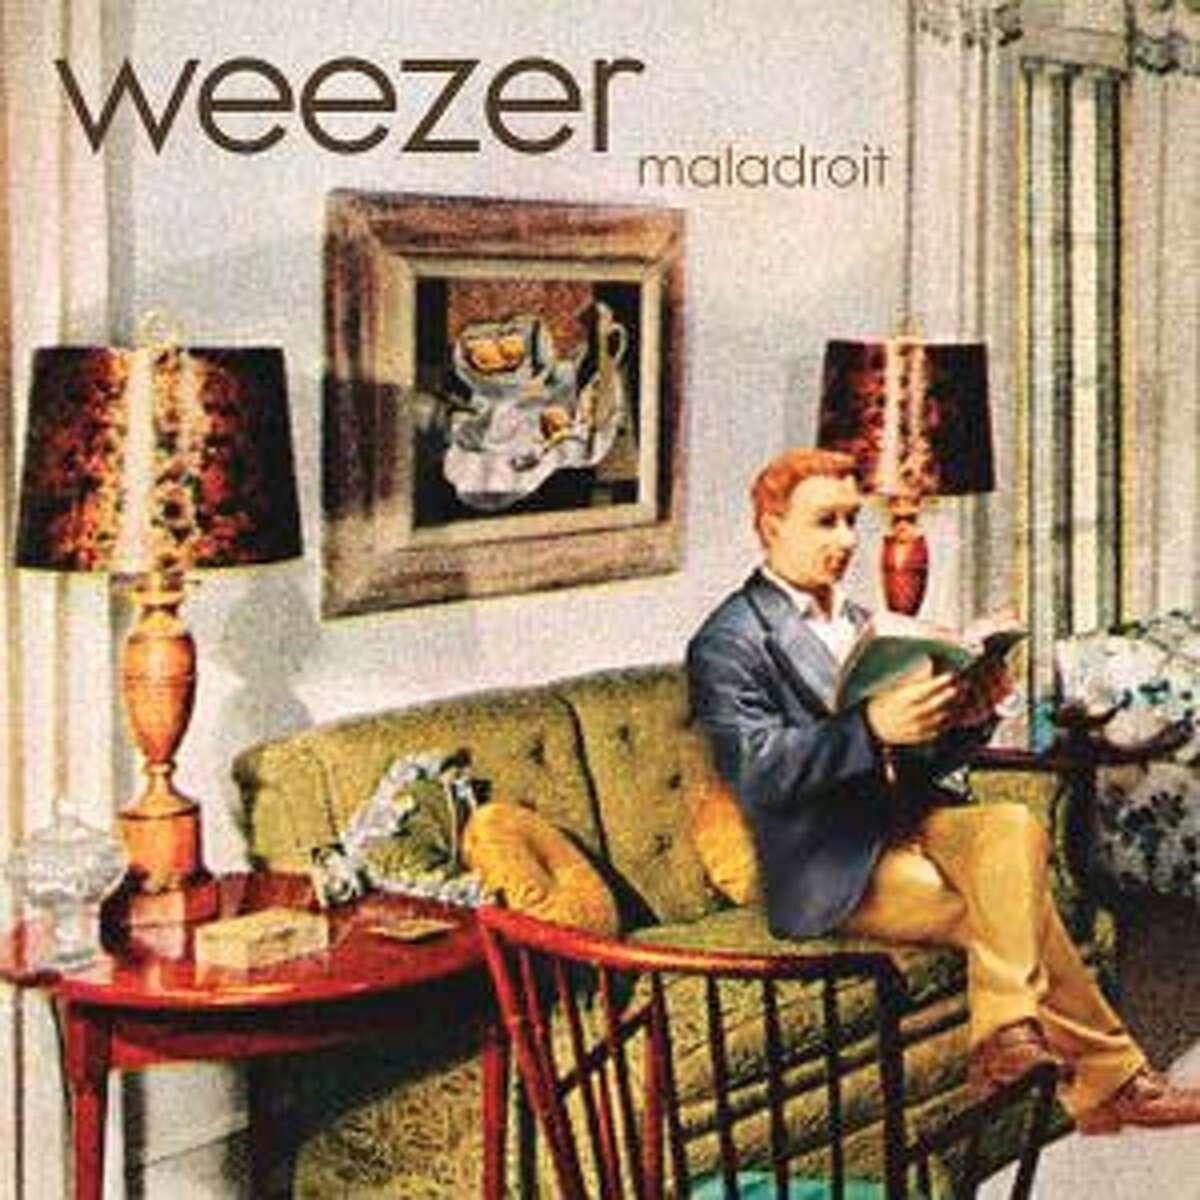 """Maladroit"" -- Weezer"